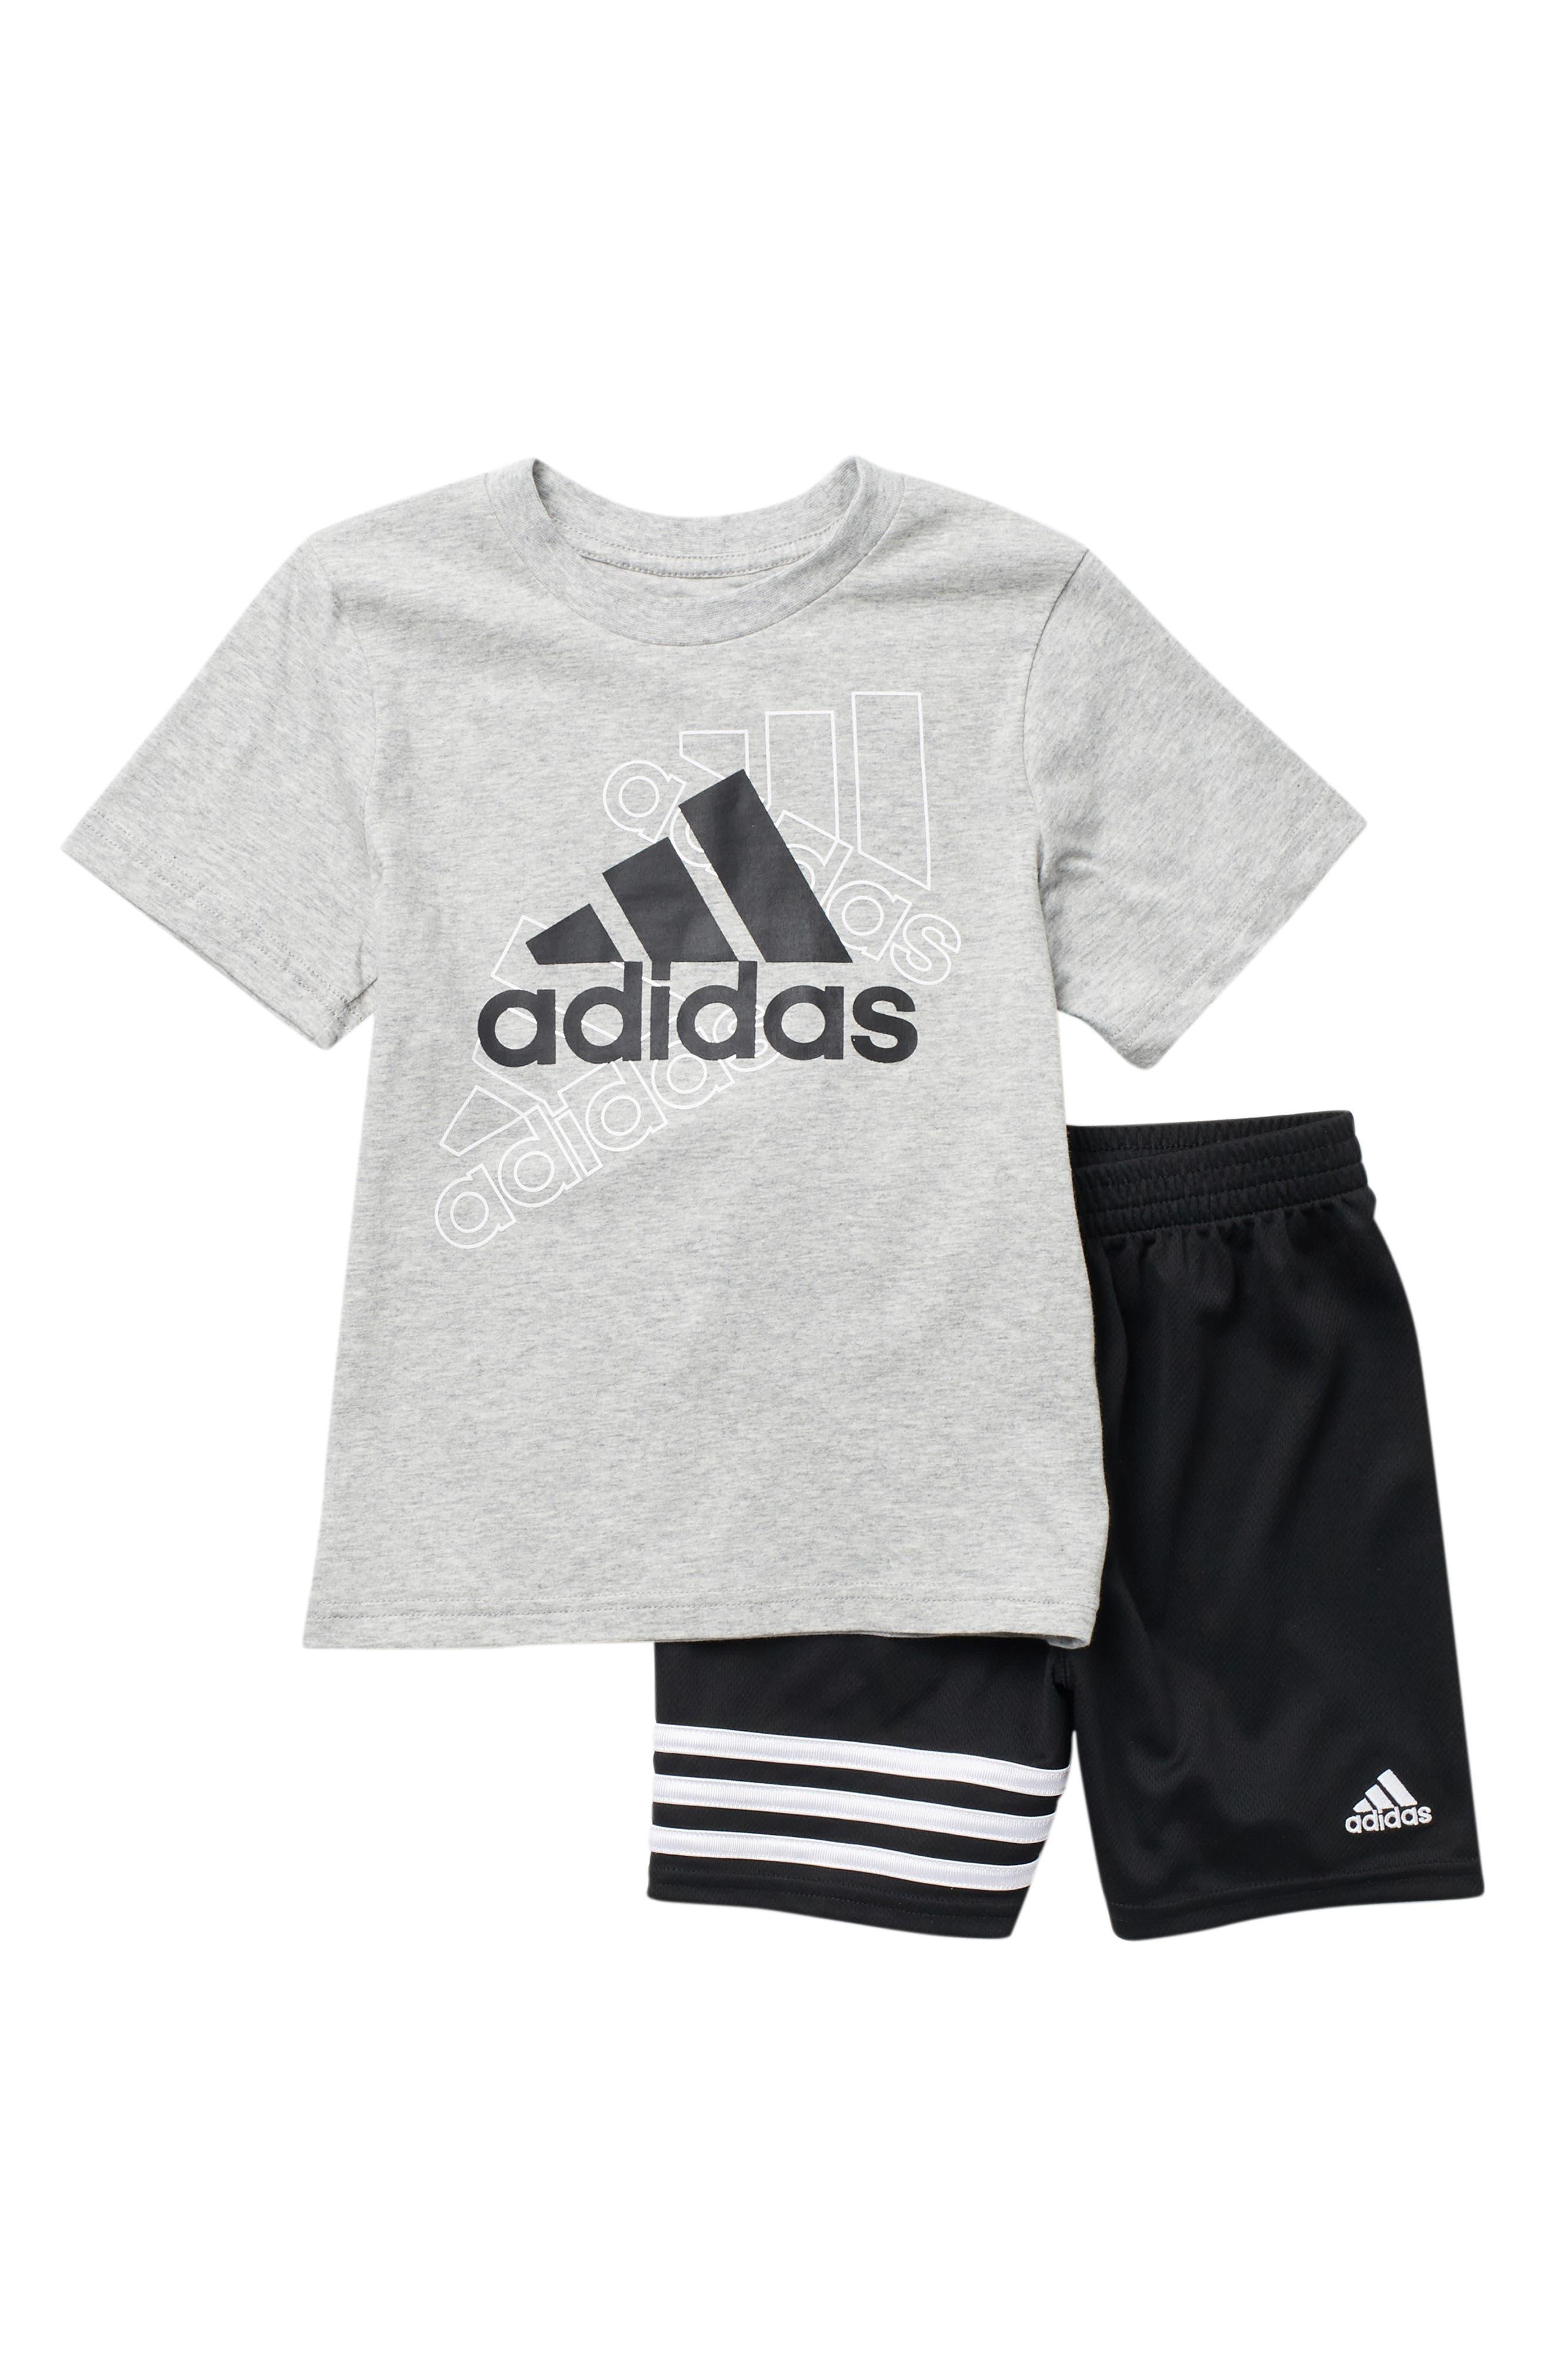 Image of adidas Cotton T-Shirt & Short Set